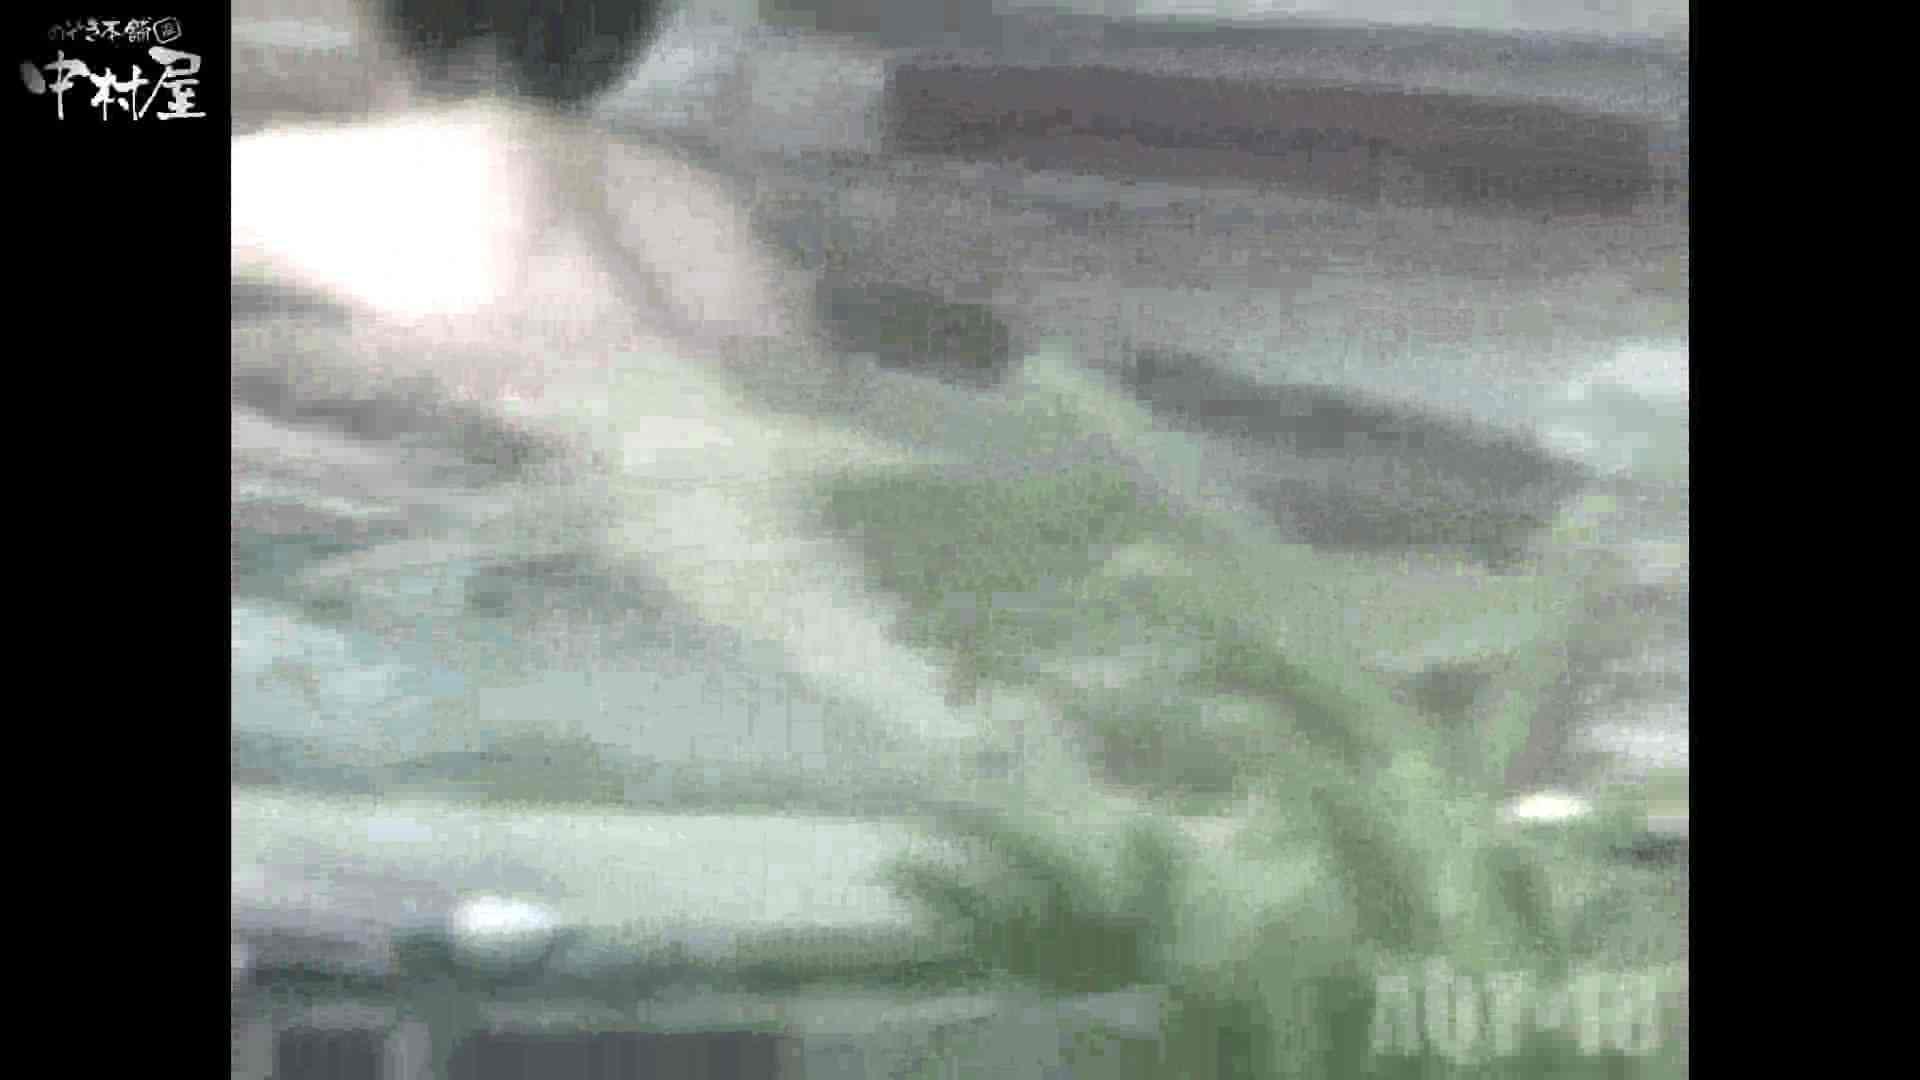 Aquaな露天風呂Vol.882潜入盗撮露天風呂十八判湯 其の二 盗撮 隠し撮りオマンコ動画紹介 39連発 23